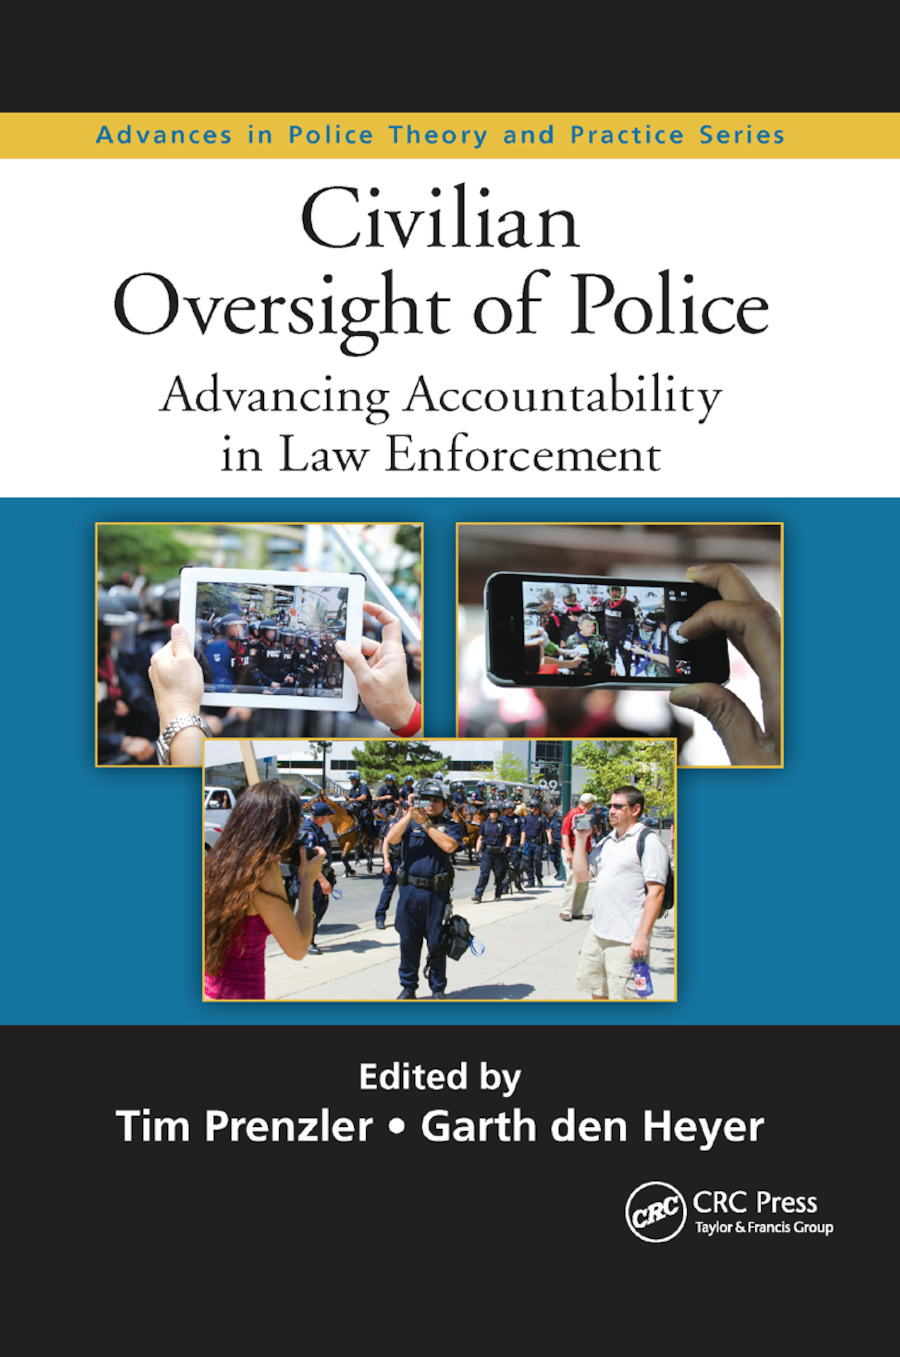 Civilian Oversight of Police